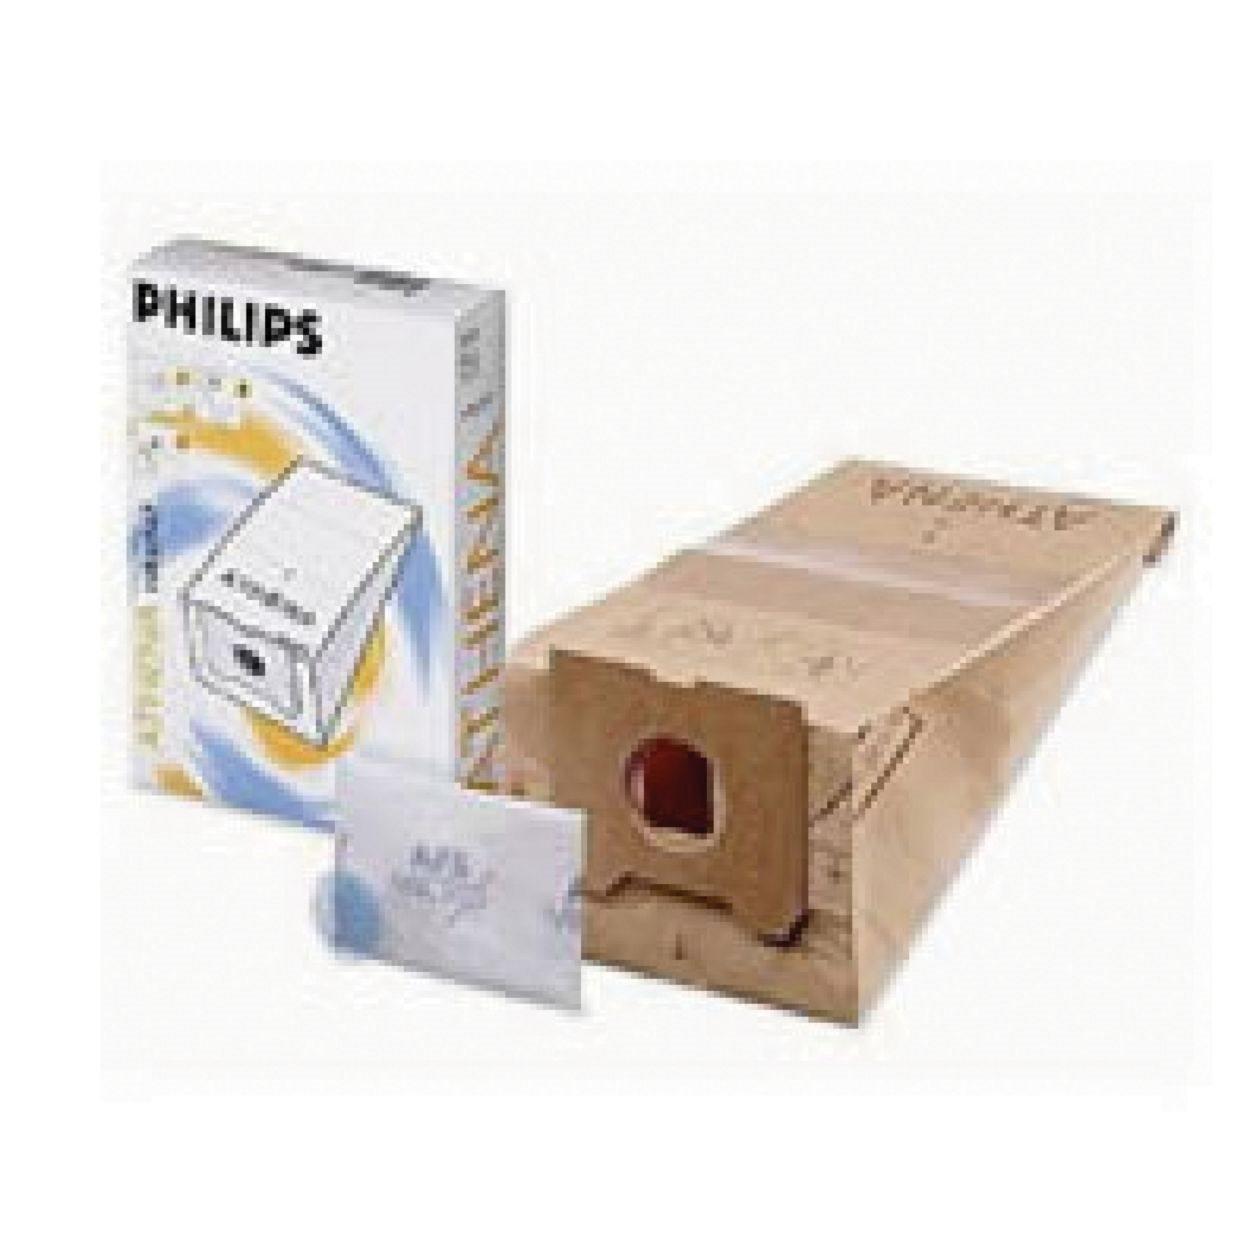 Philips σακούλες σκούπας HR6947/01